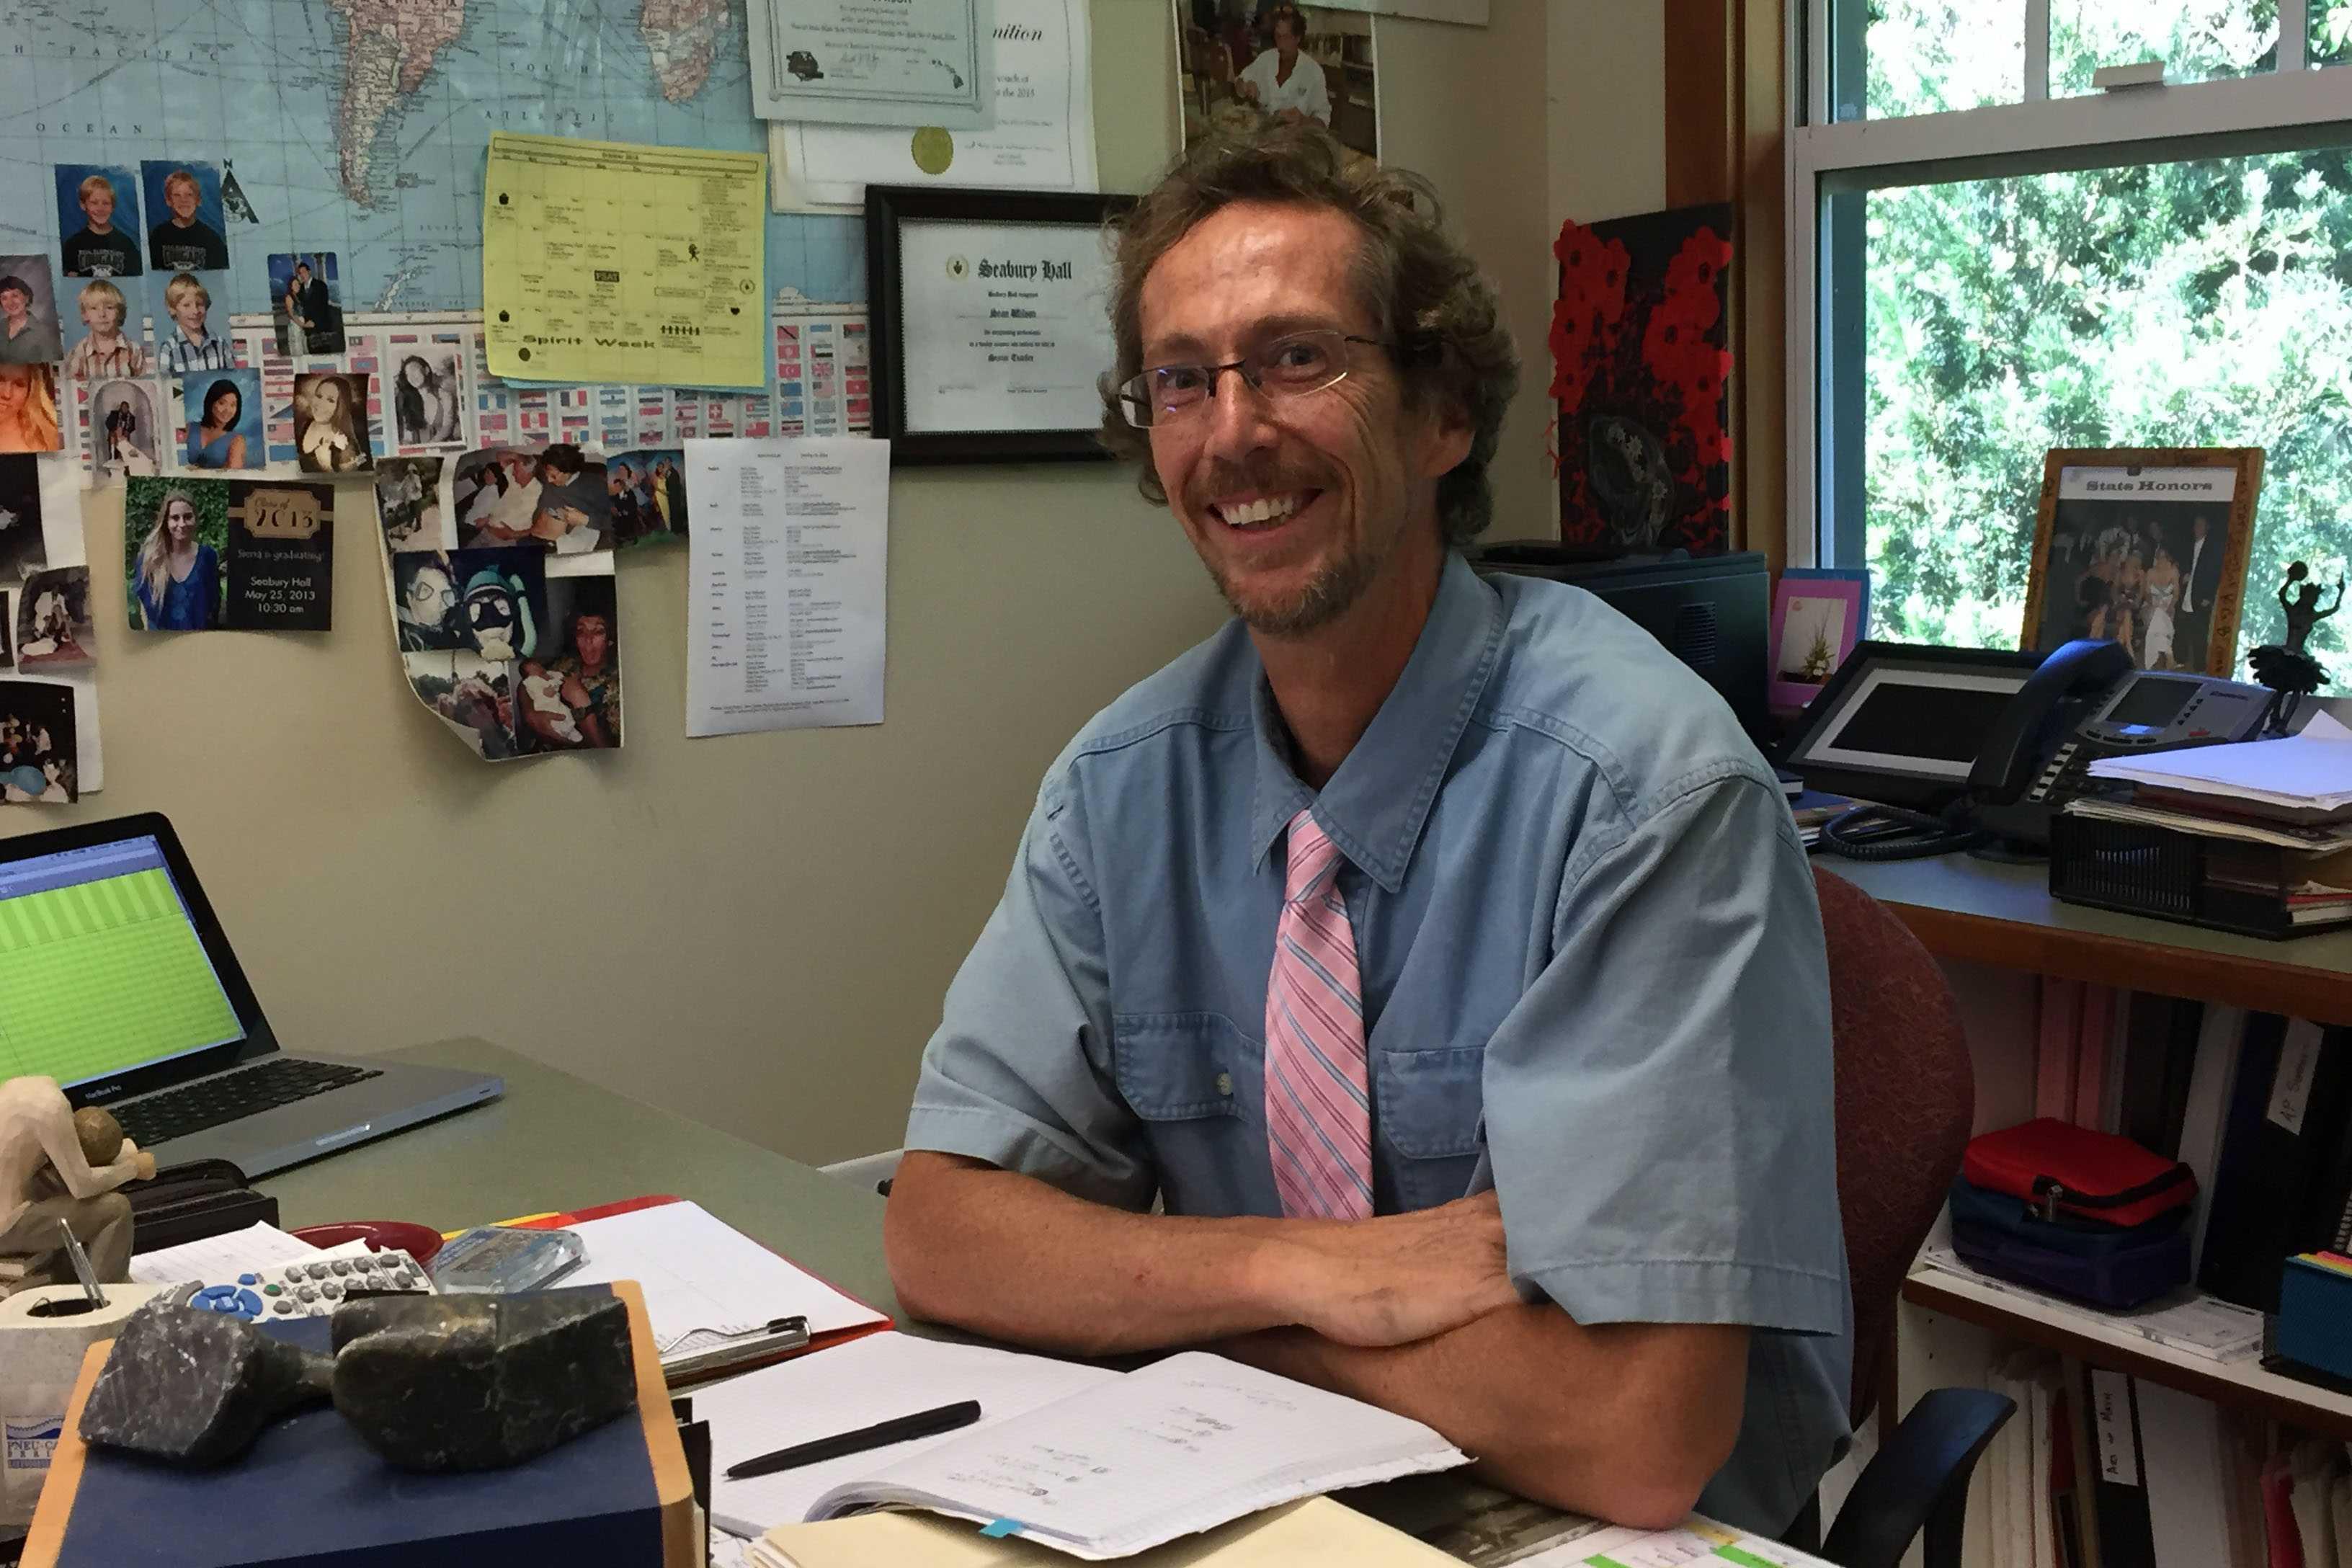 Seabury Hall's animated math teacher Sean Wilson shares his love for math with his students.